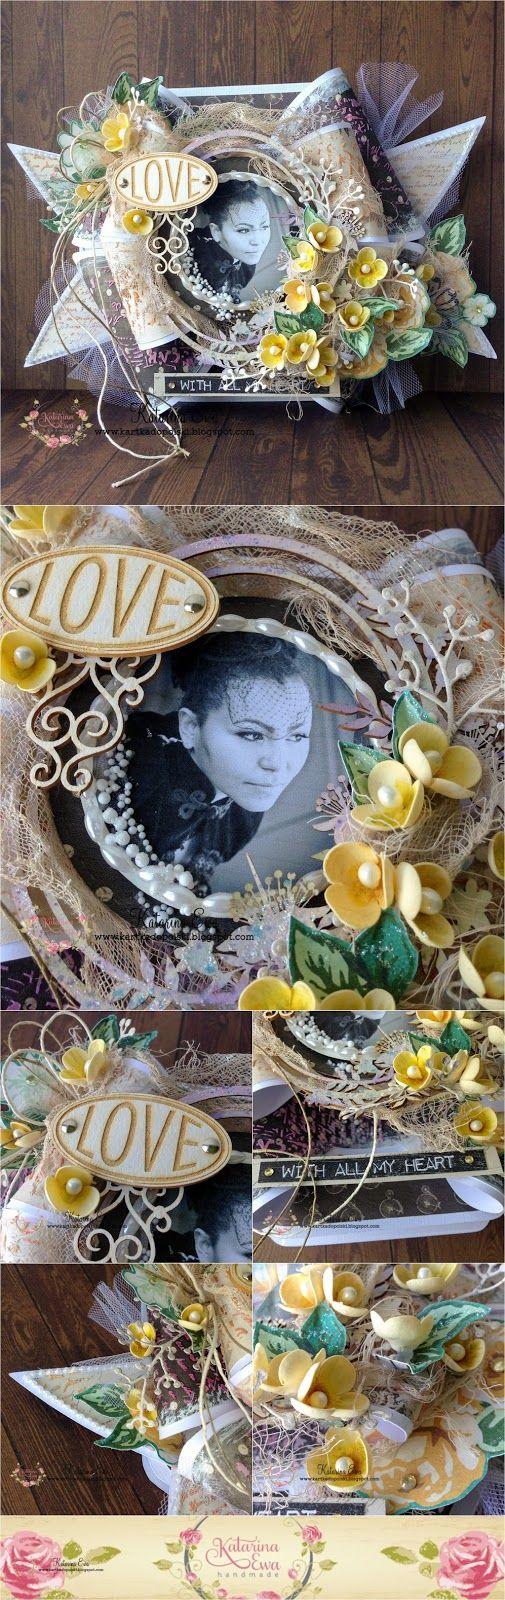 211. Vintage style bow card #Sandra'sScrapshop #Studio75 #egocraft #craftymoly #foamiranirland #americancrafts #KatararinaEwahandmade